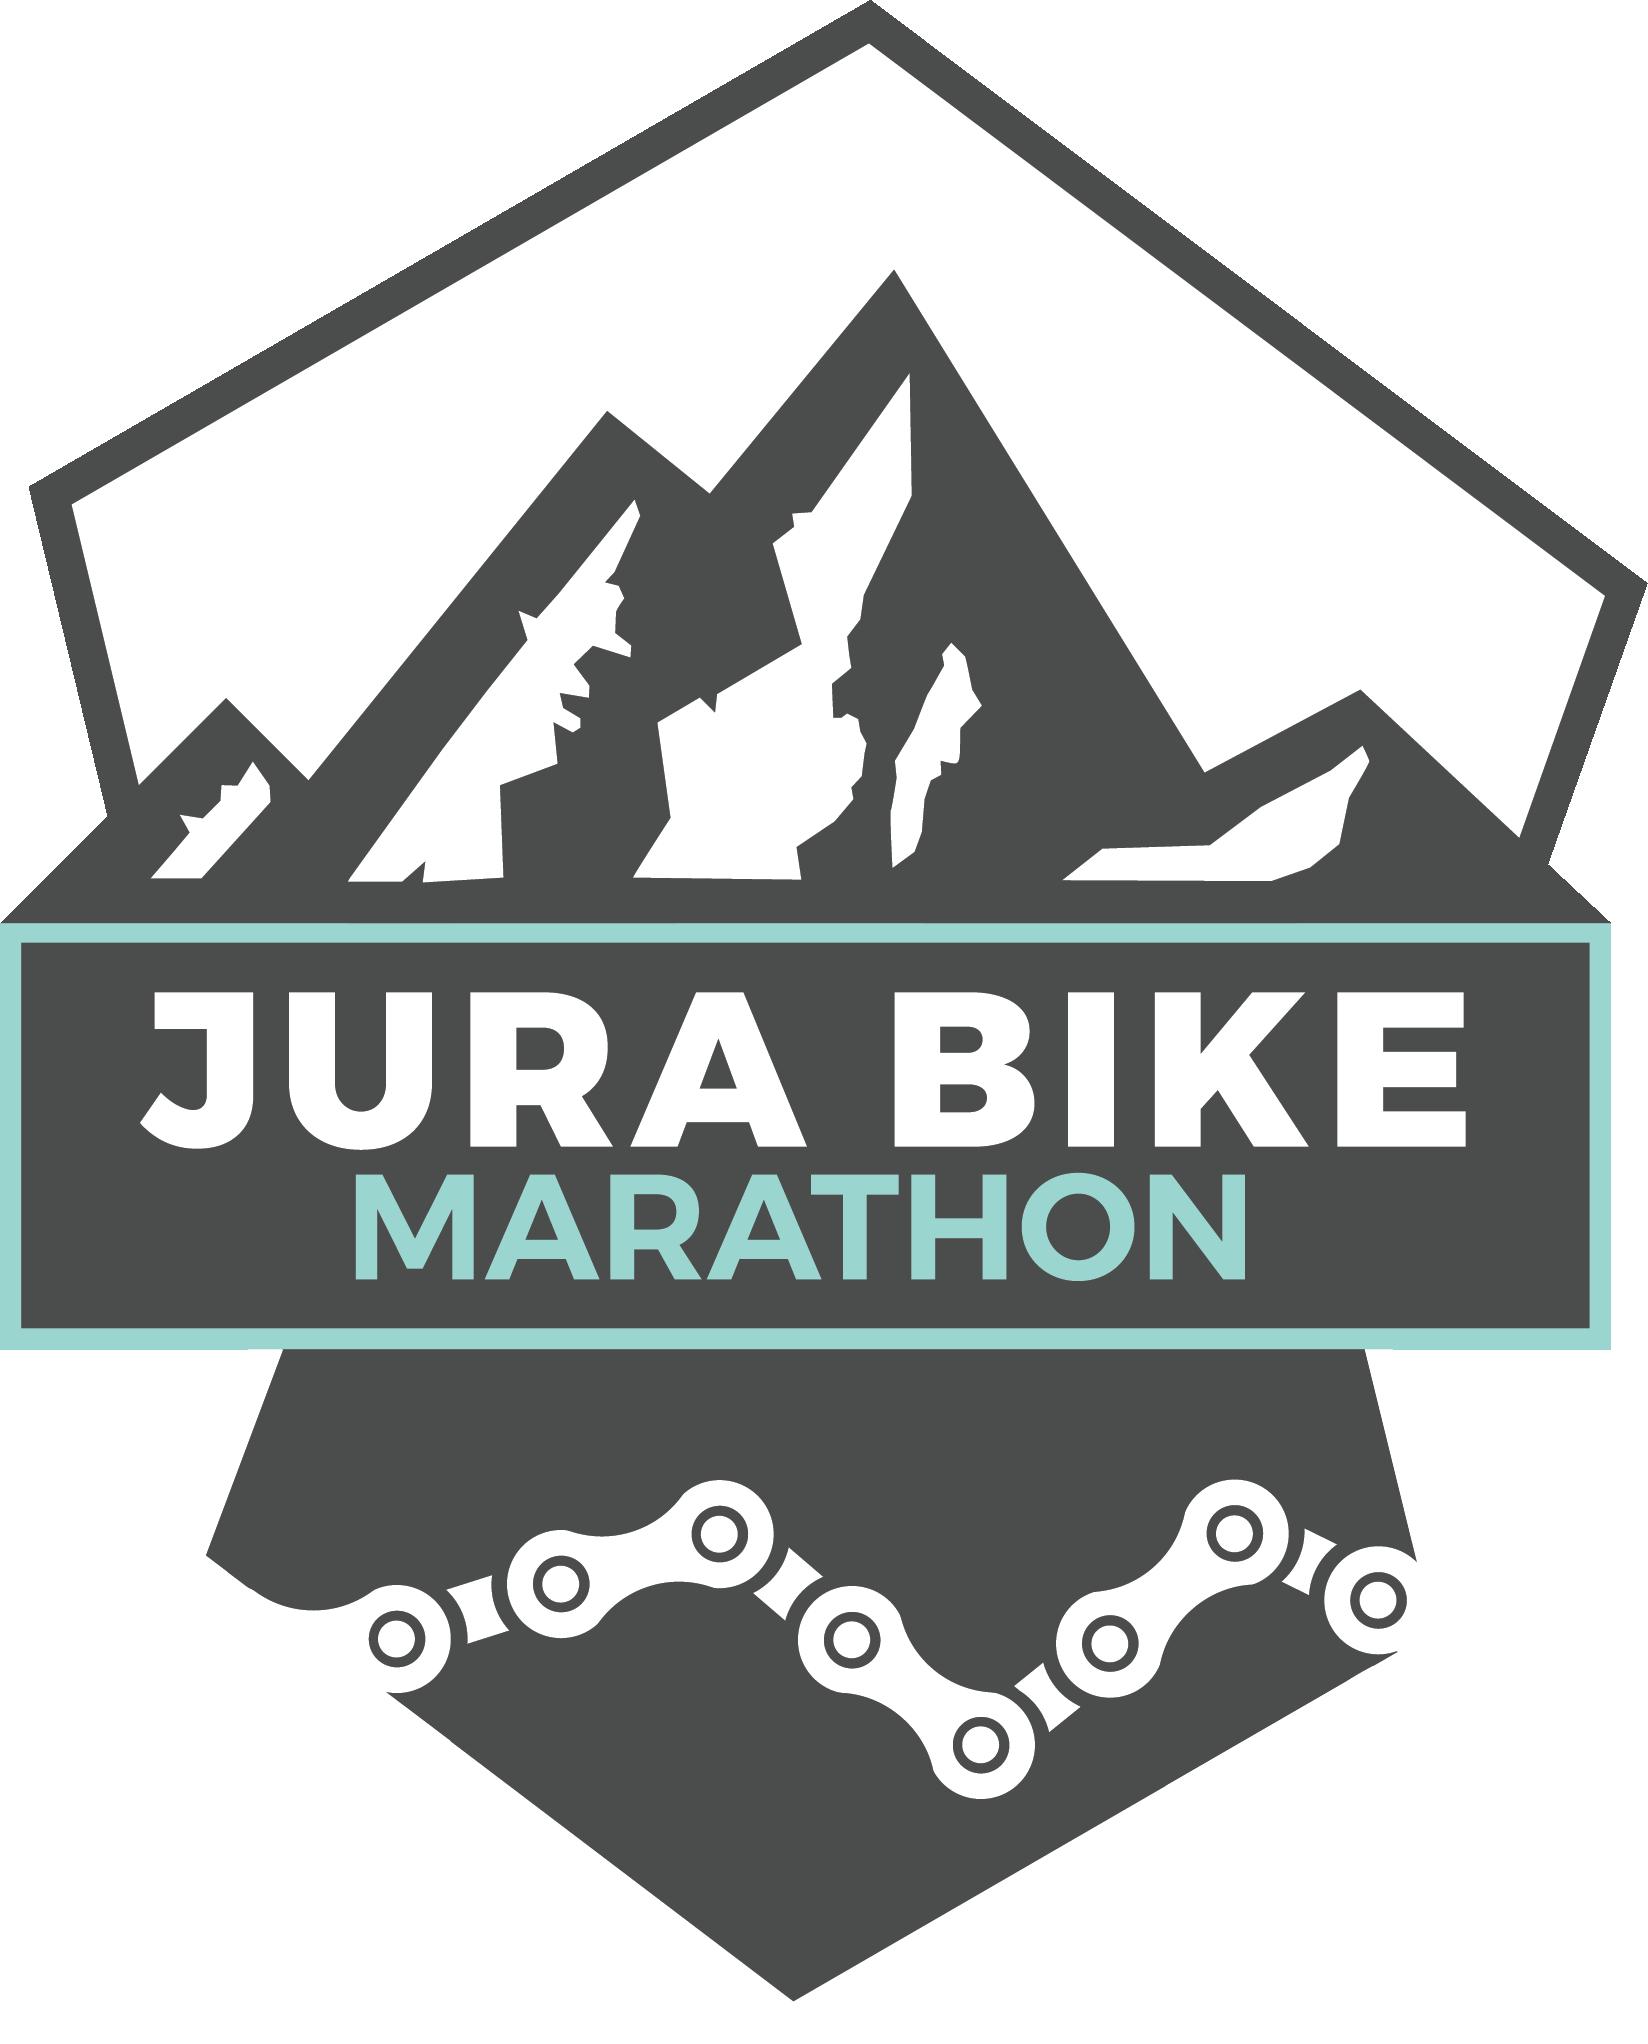 Jura bike marathon